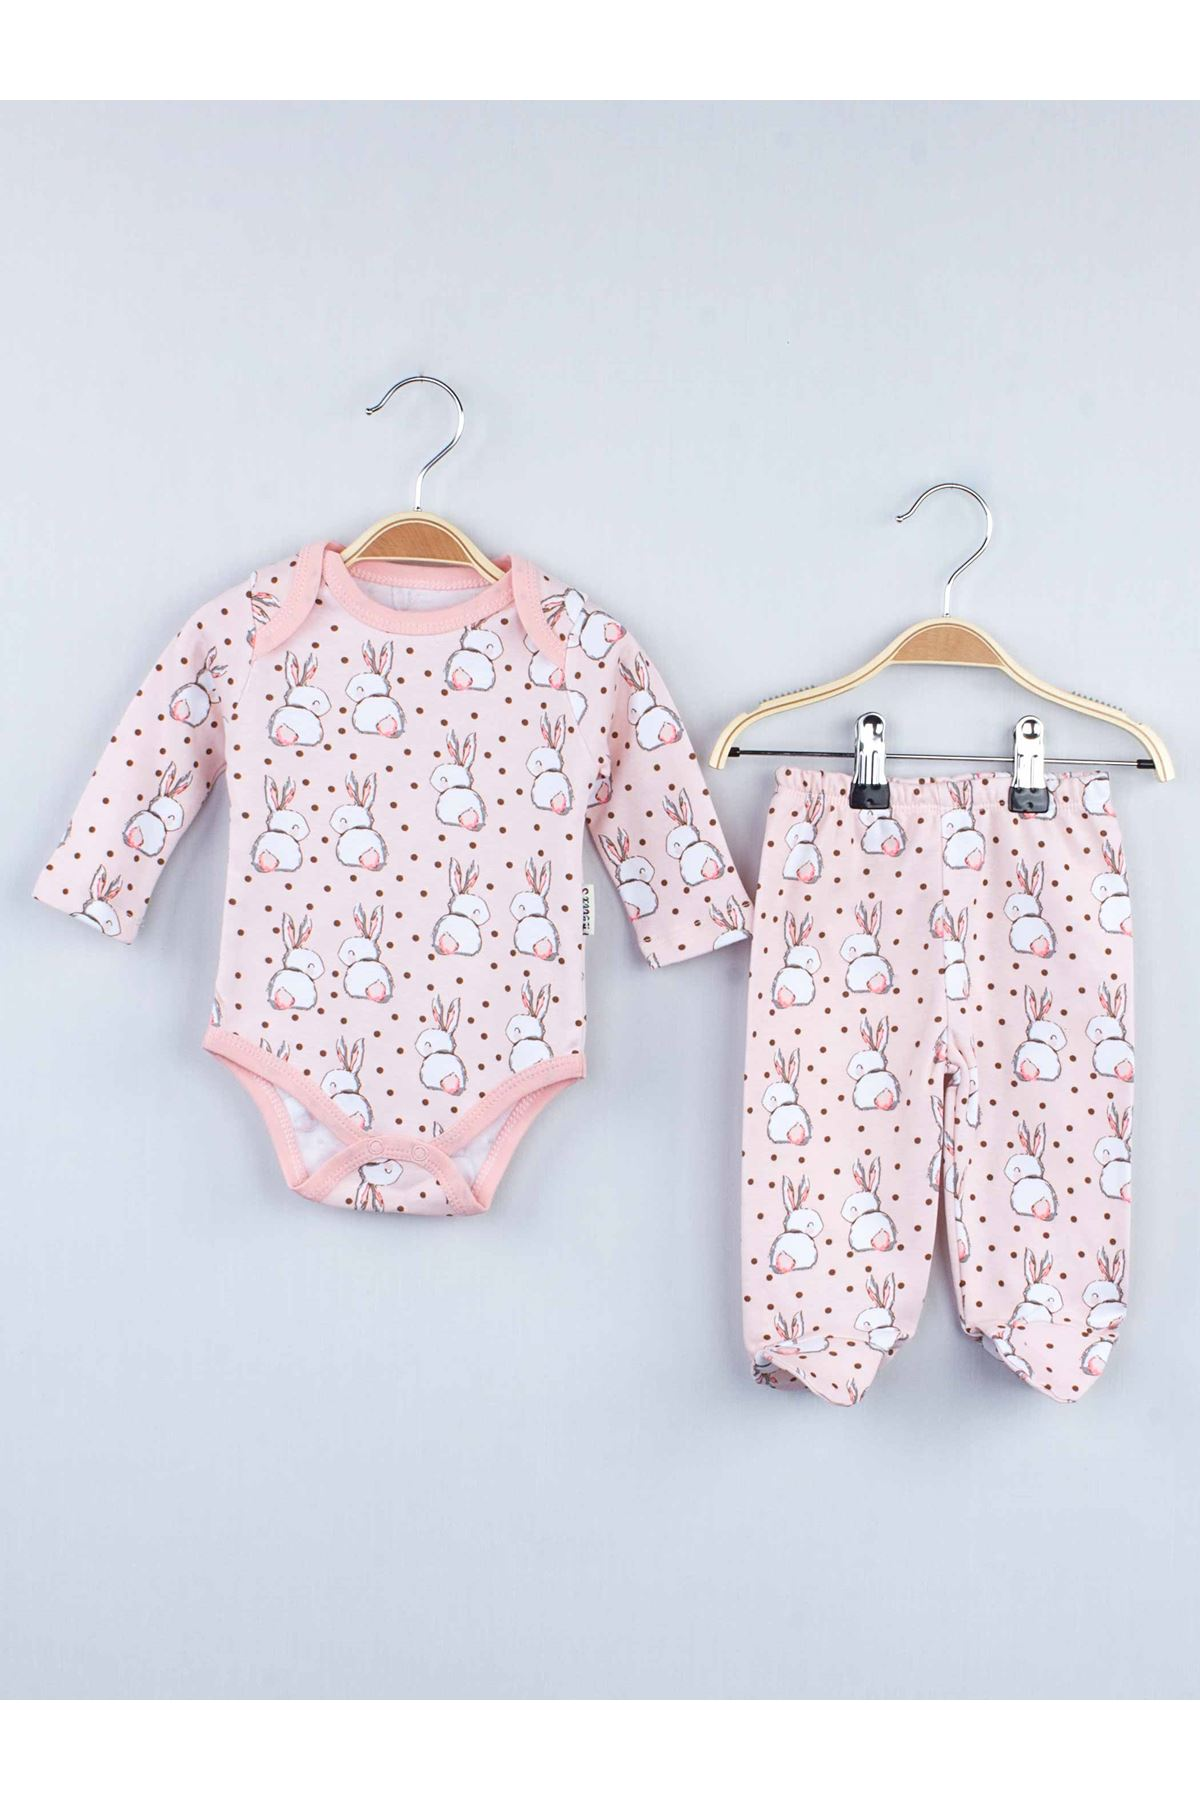 Powder Seasonal Girl Baby Badili Suit